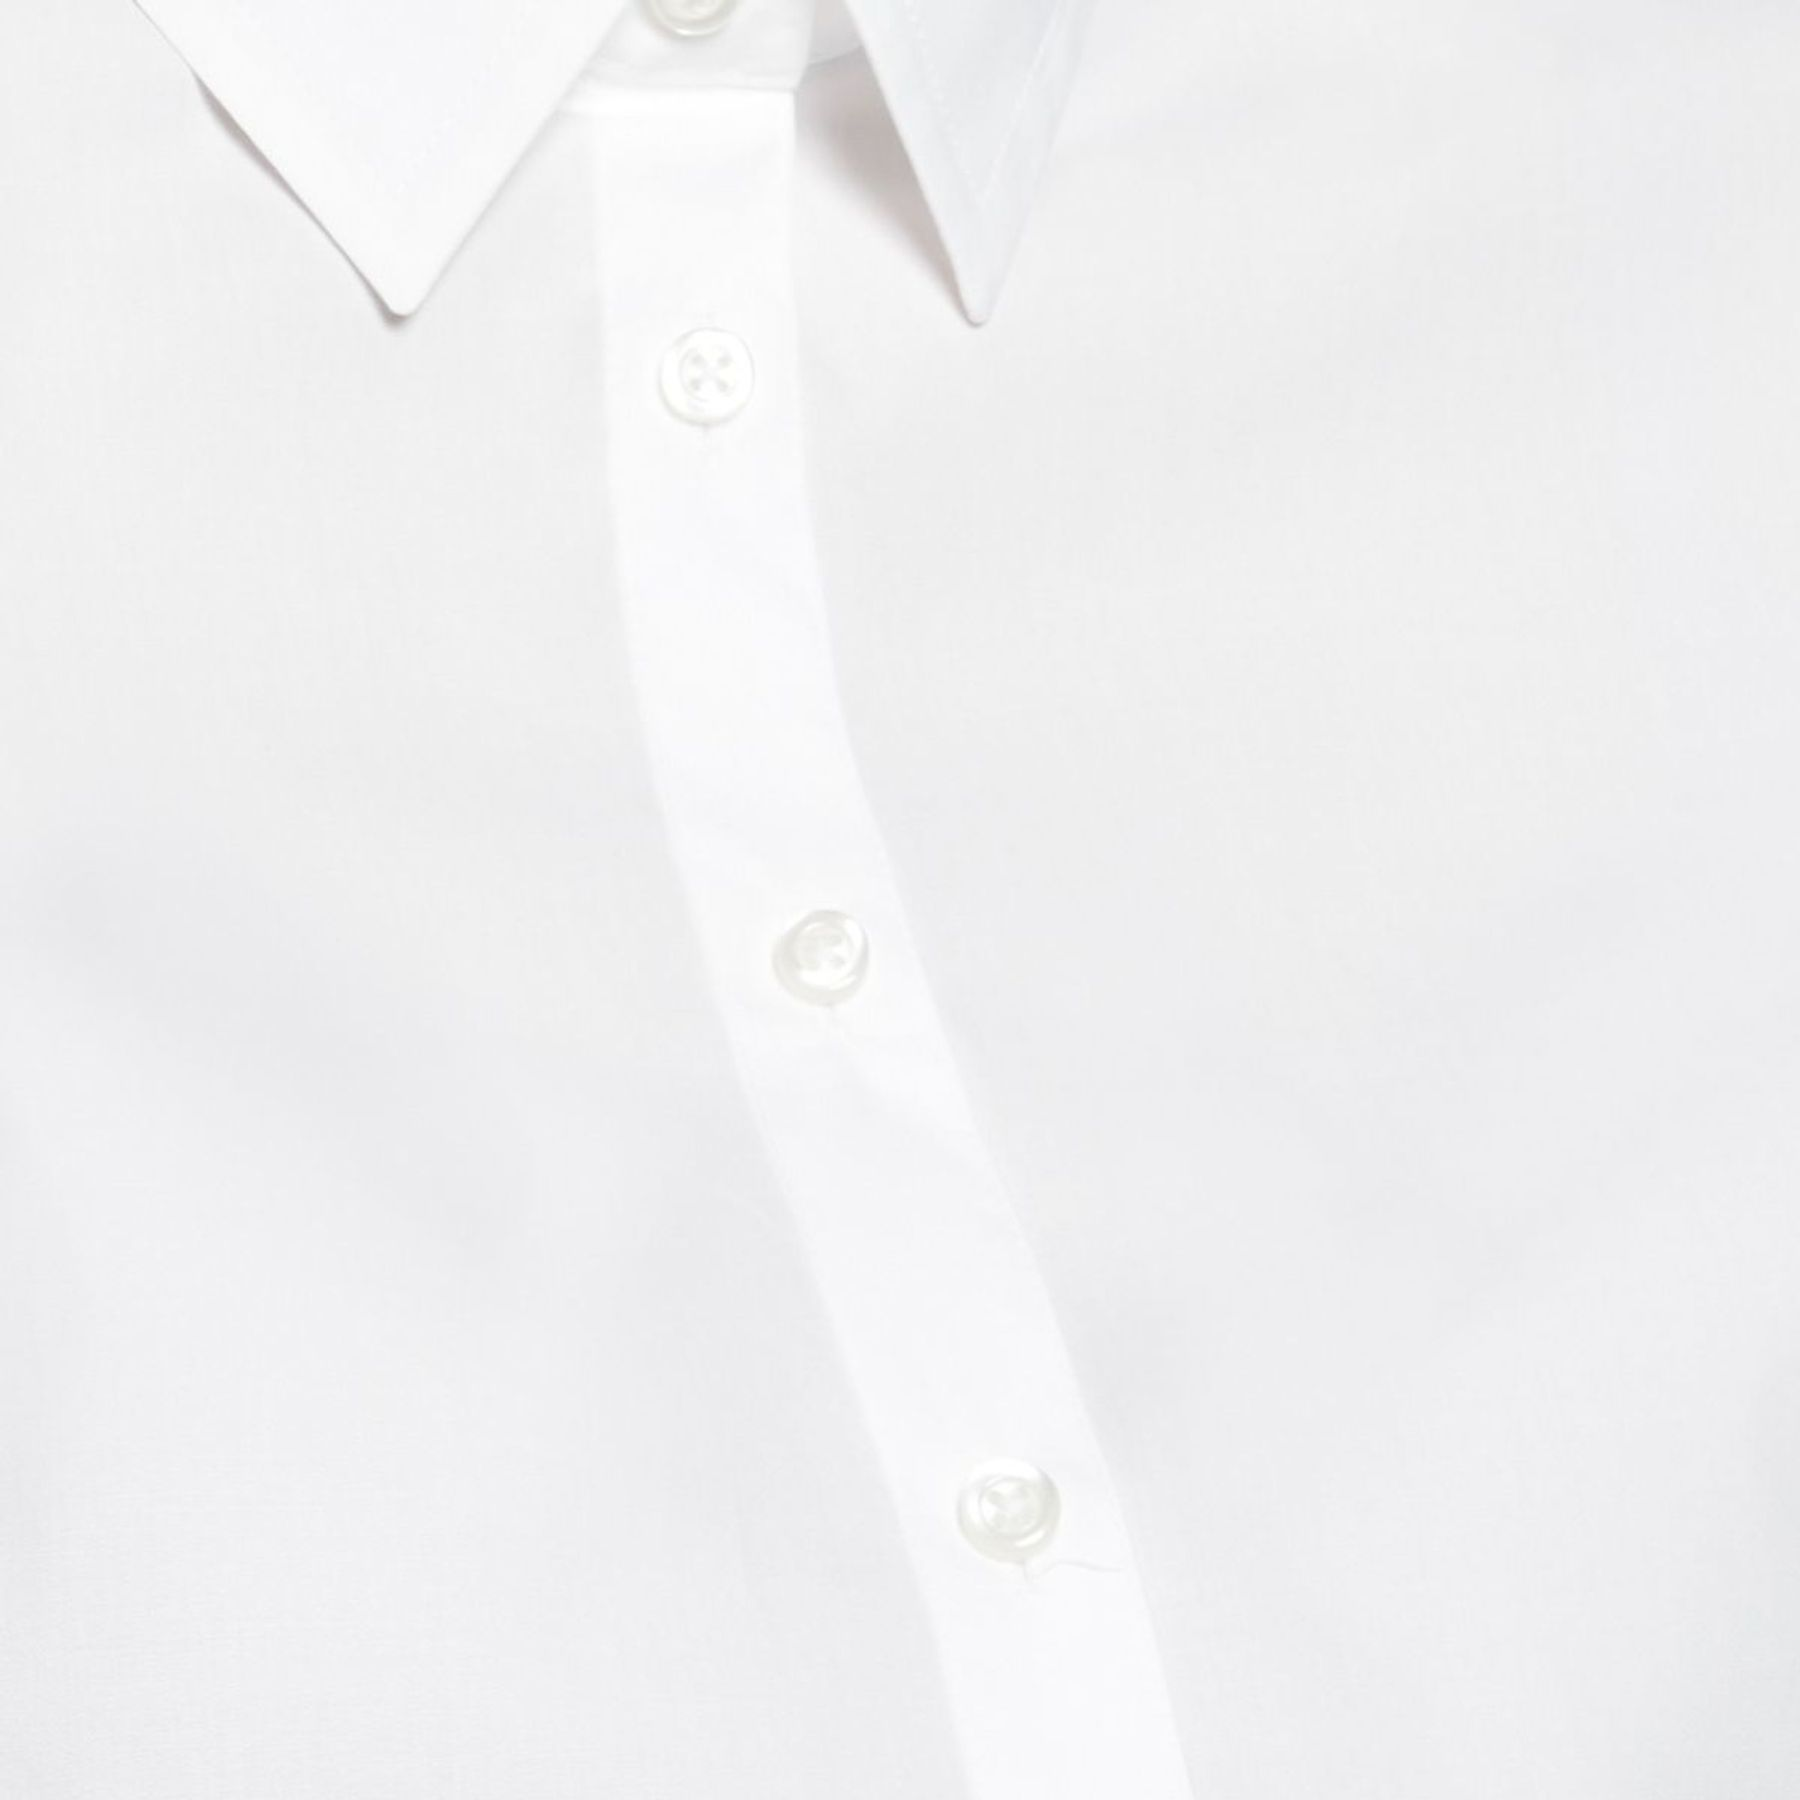 Seidensticker Schwarze Rose - Damen City-Bluse 1/1-lang (60.080612) – Bild 6